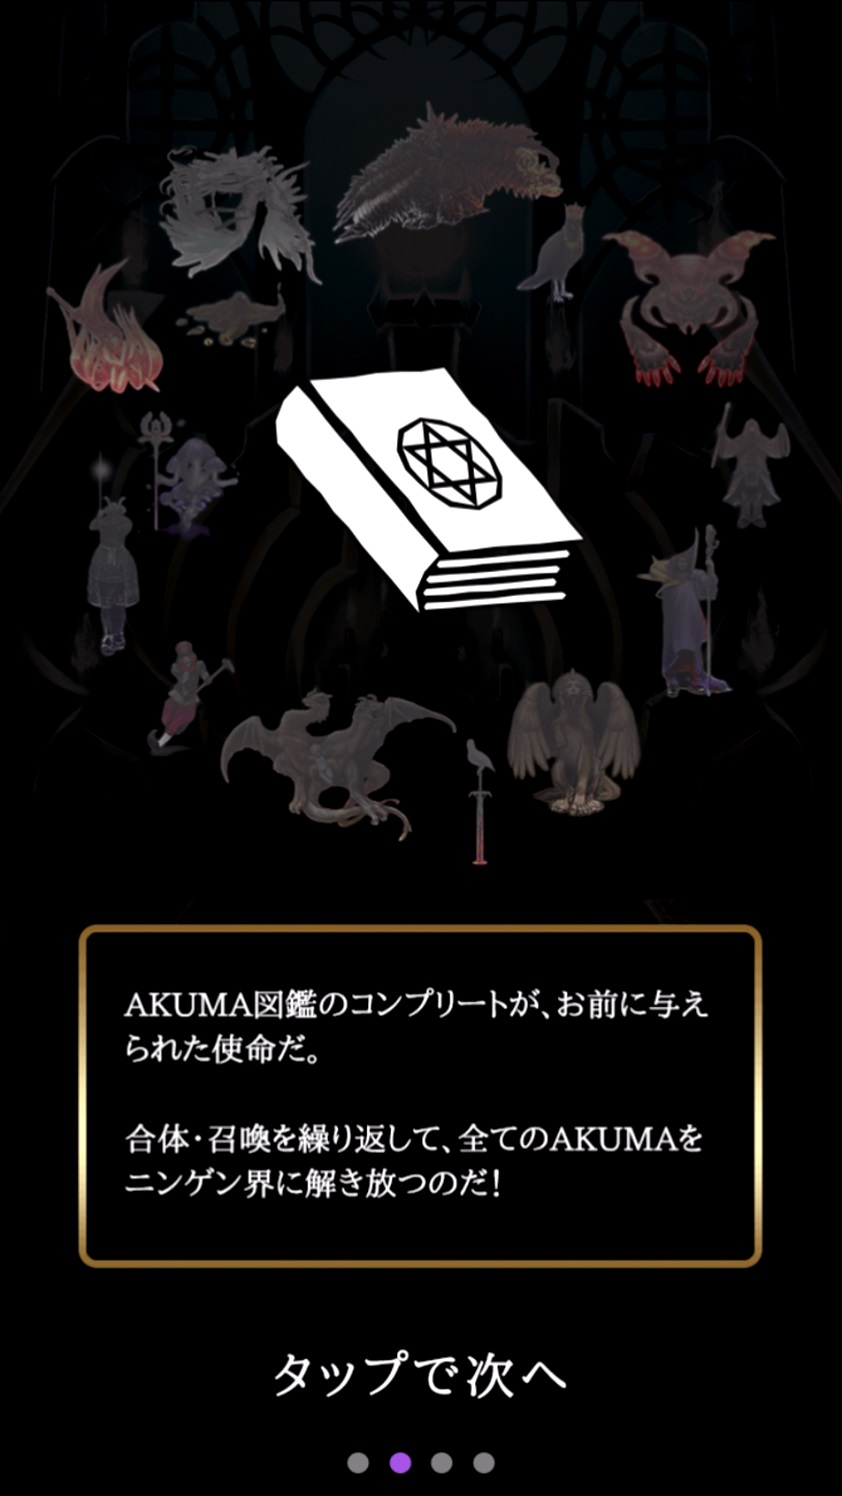 androidアプリ 召喚AKUMA/悪魔合体召喚攻略スクリーンショット2